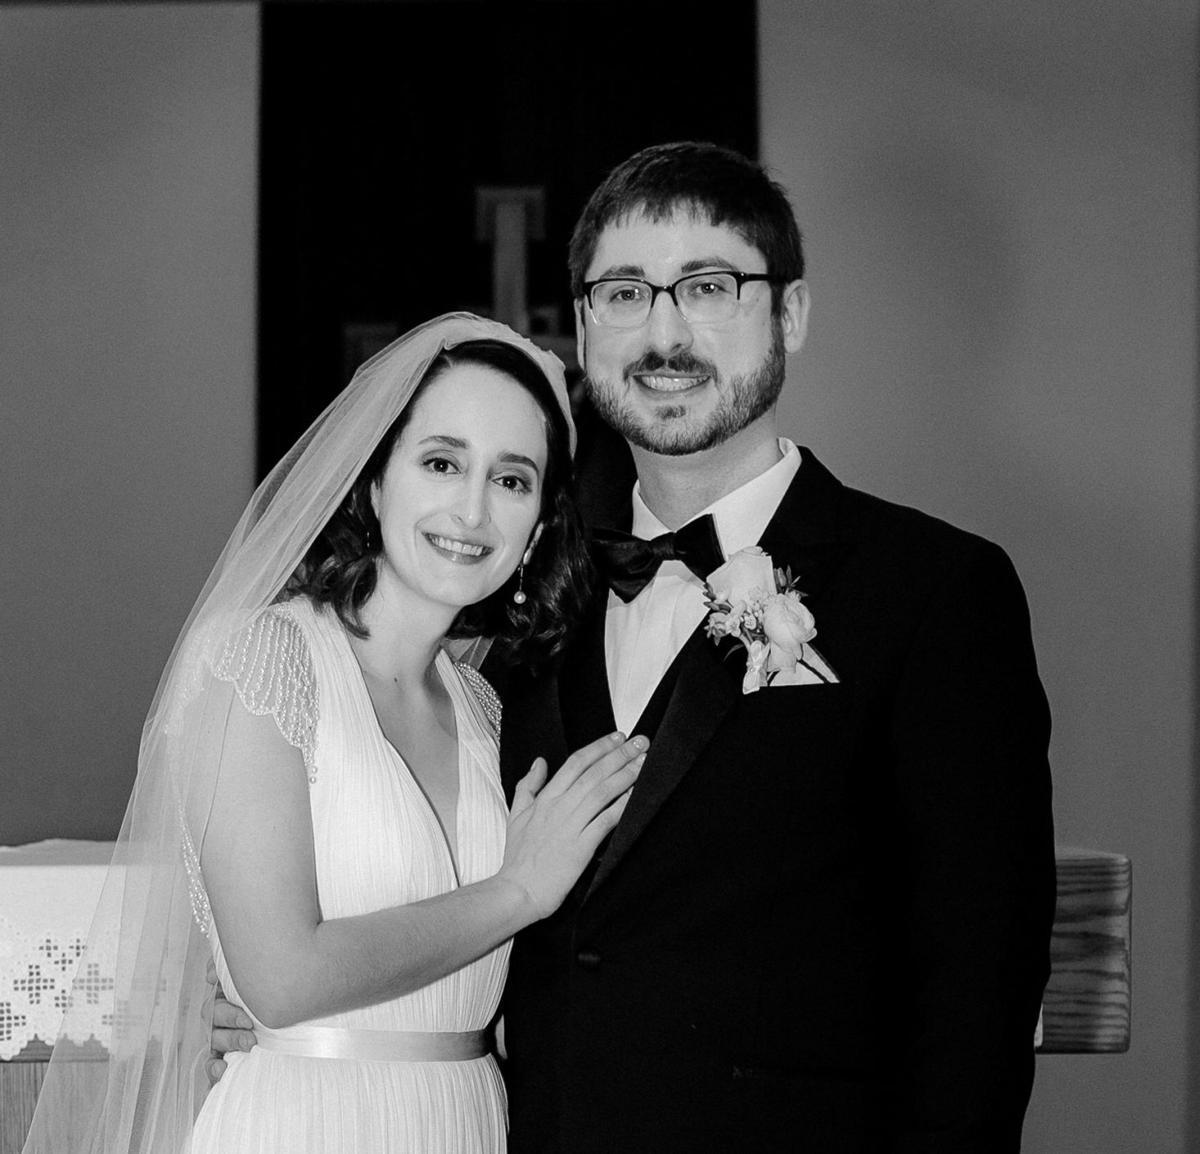 Vecchiato-Pellatt Wedding Photo BW.jpeg